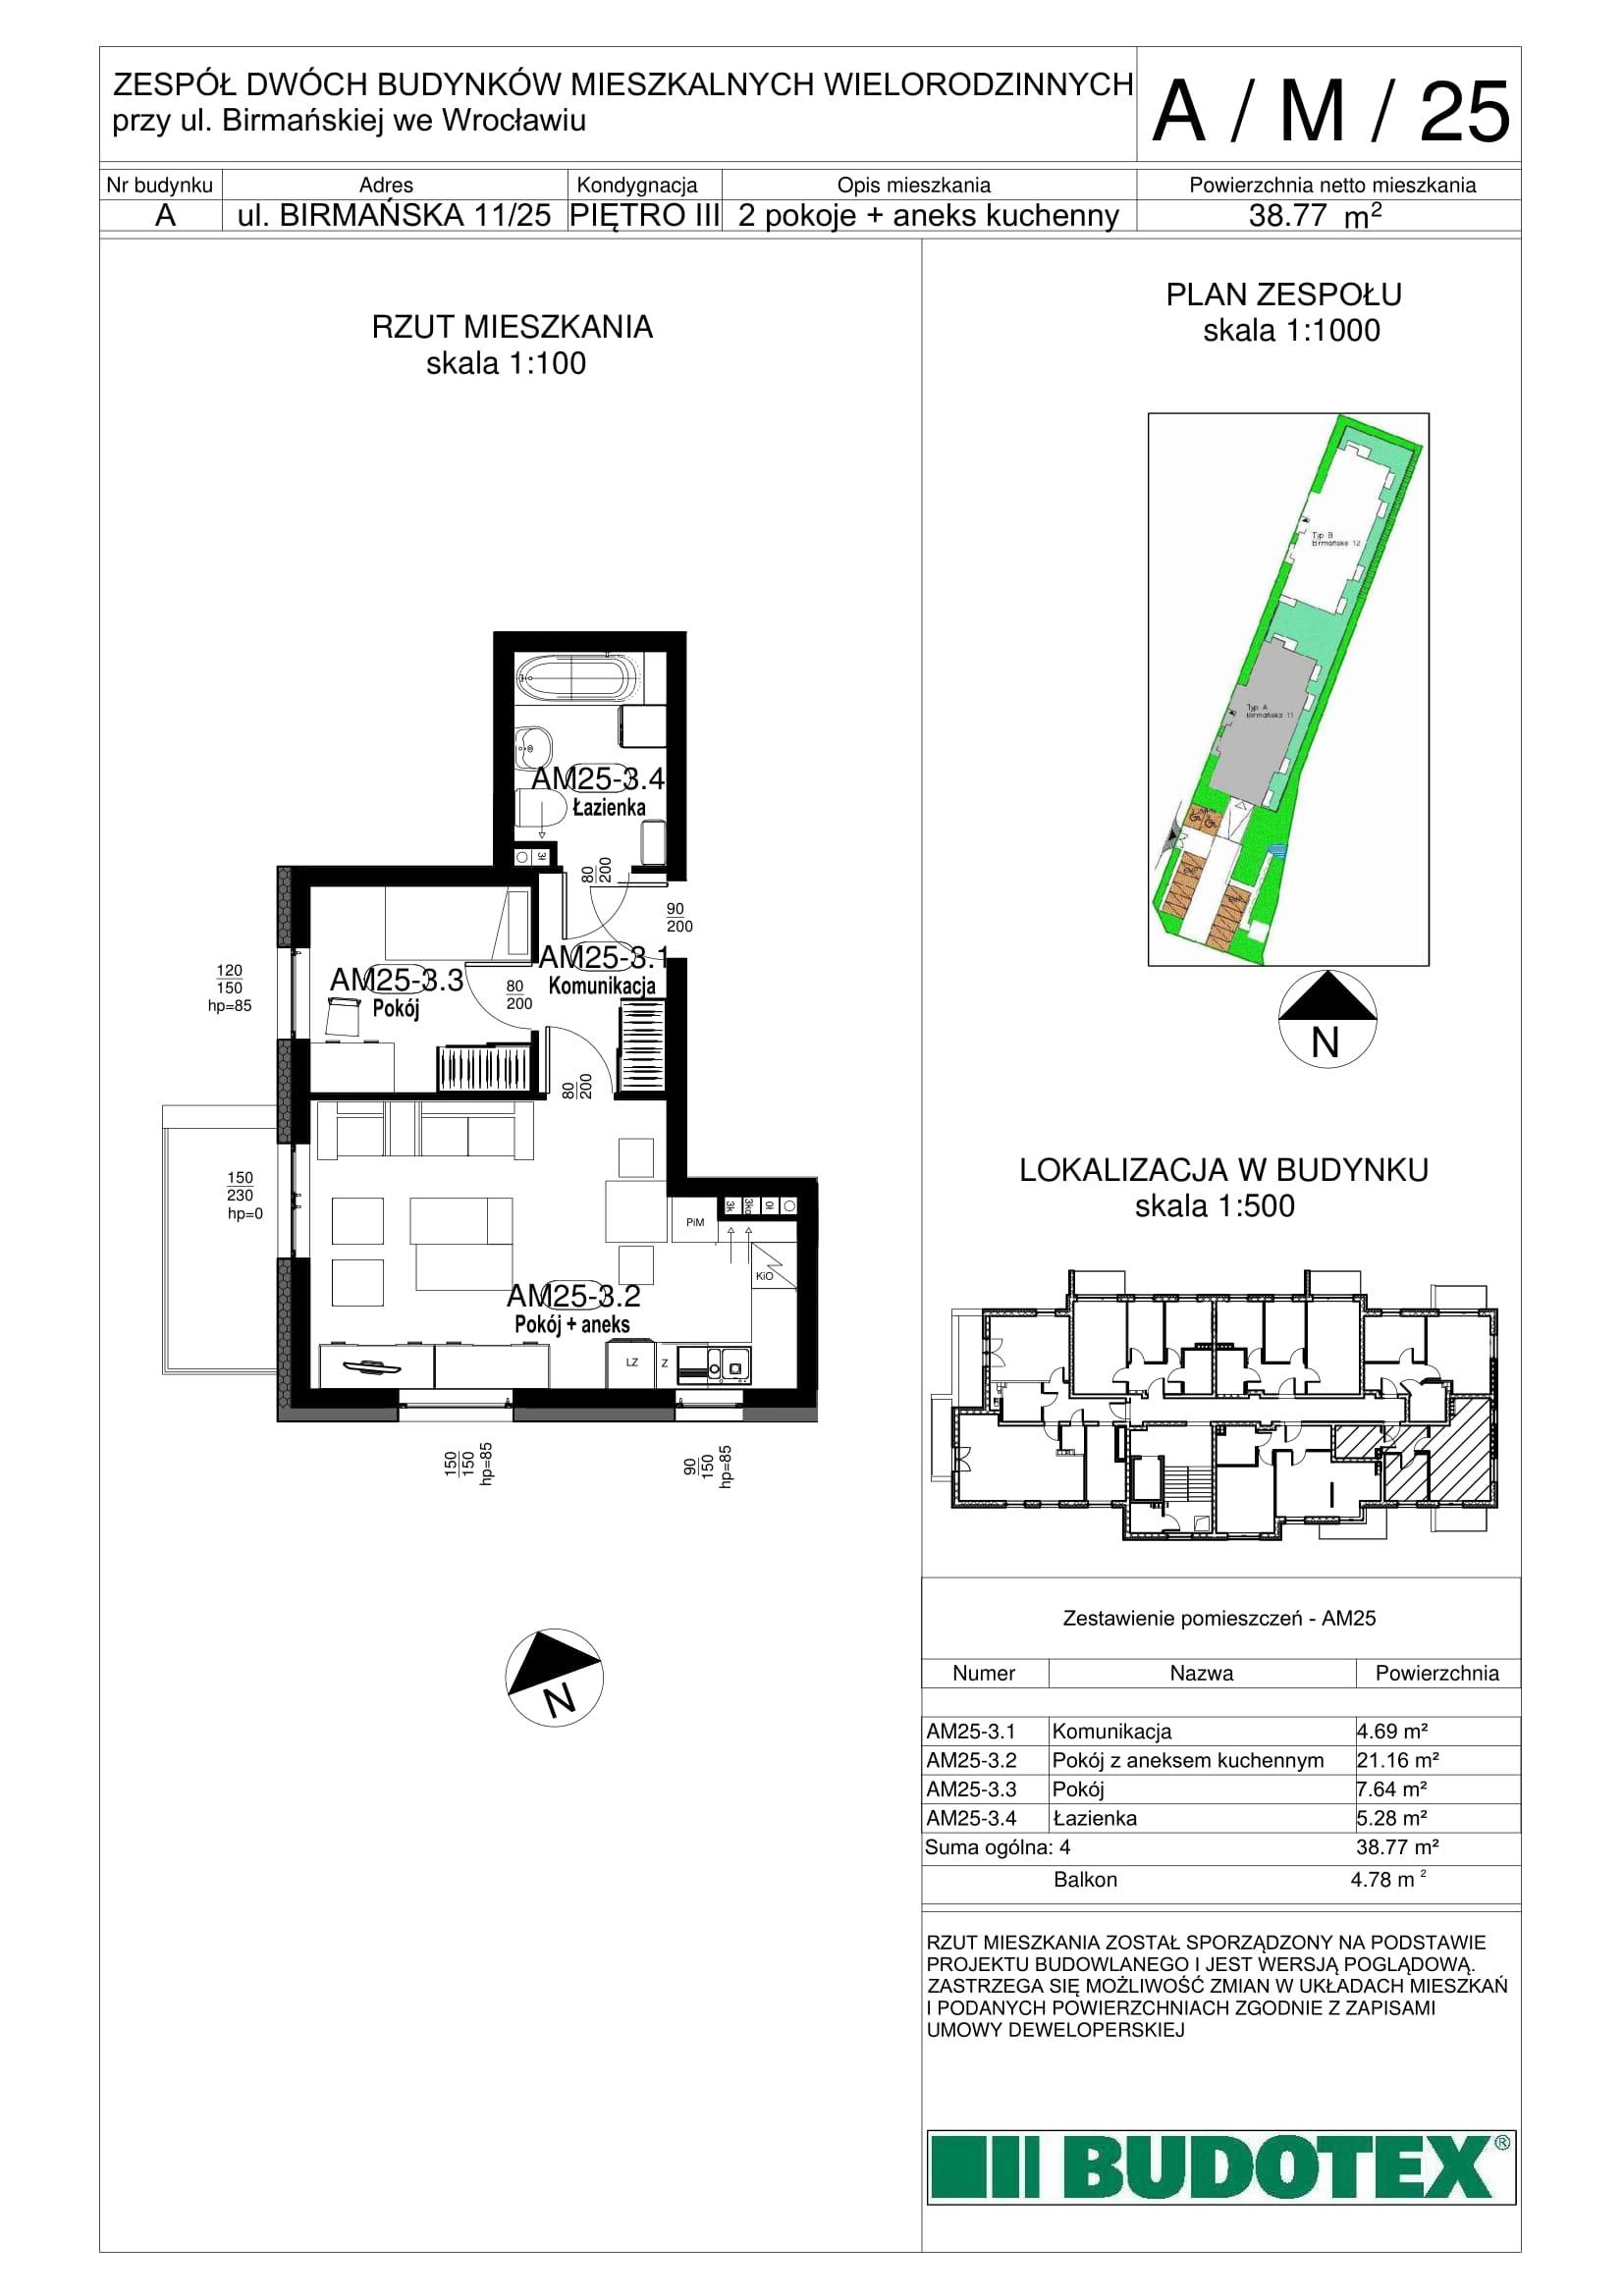 Mieszkanie nr A/M/25